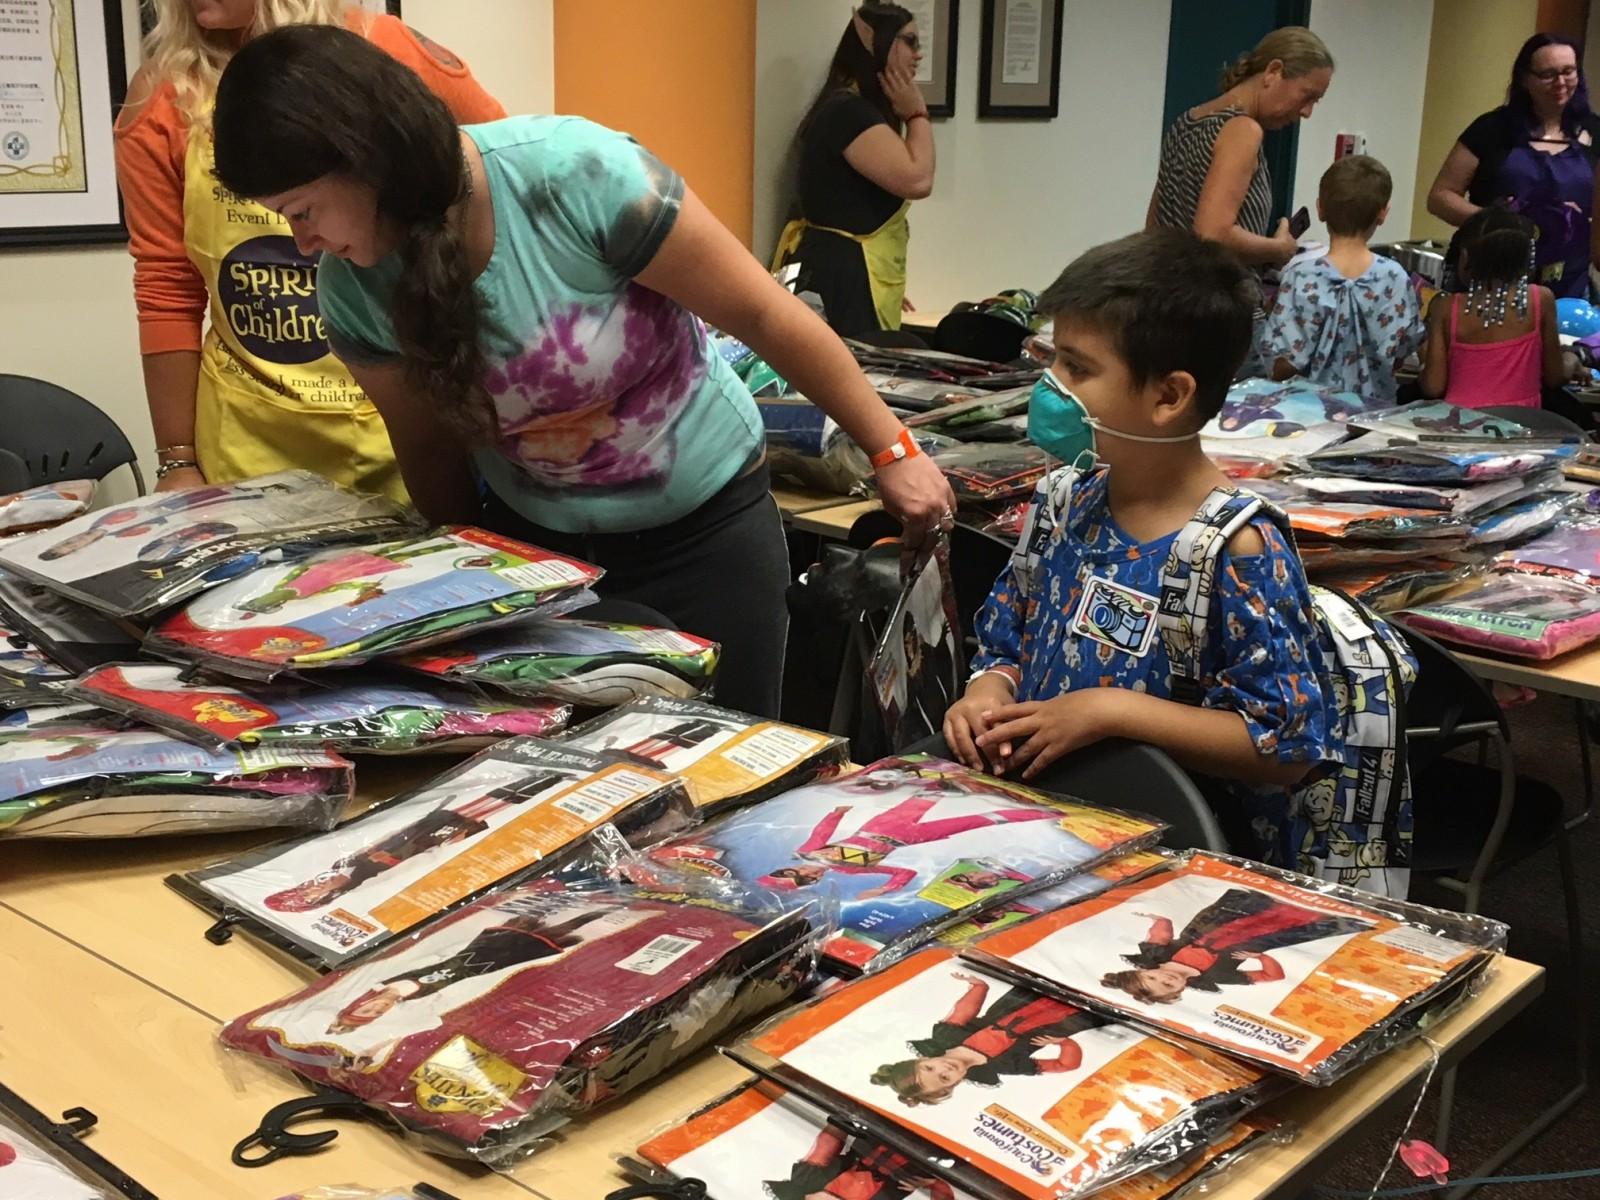 fox 4: spirit halloween donates dozens of costumes to kids at